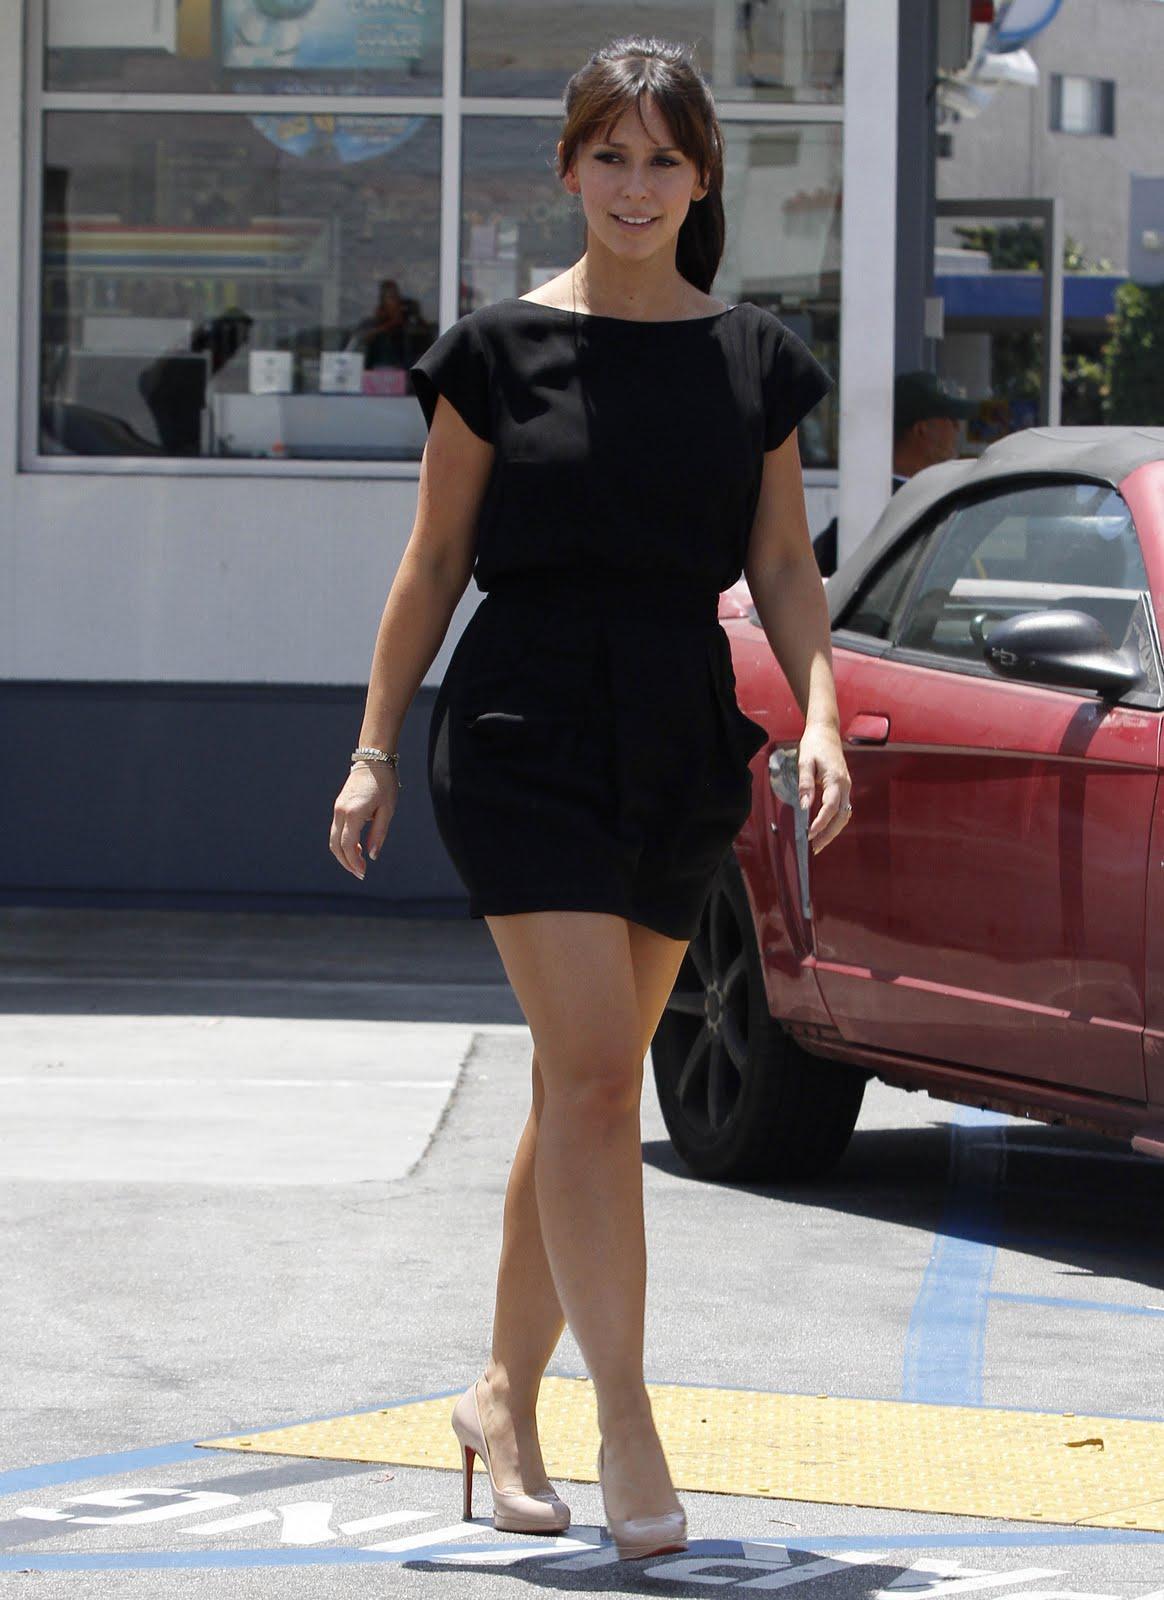 Jennifer Love Hewitt Nude in a Perfect World (34 PICS)